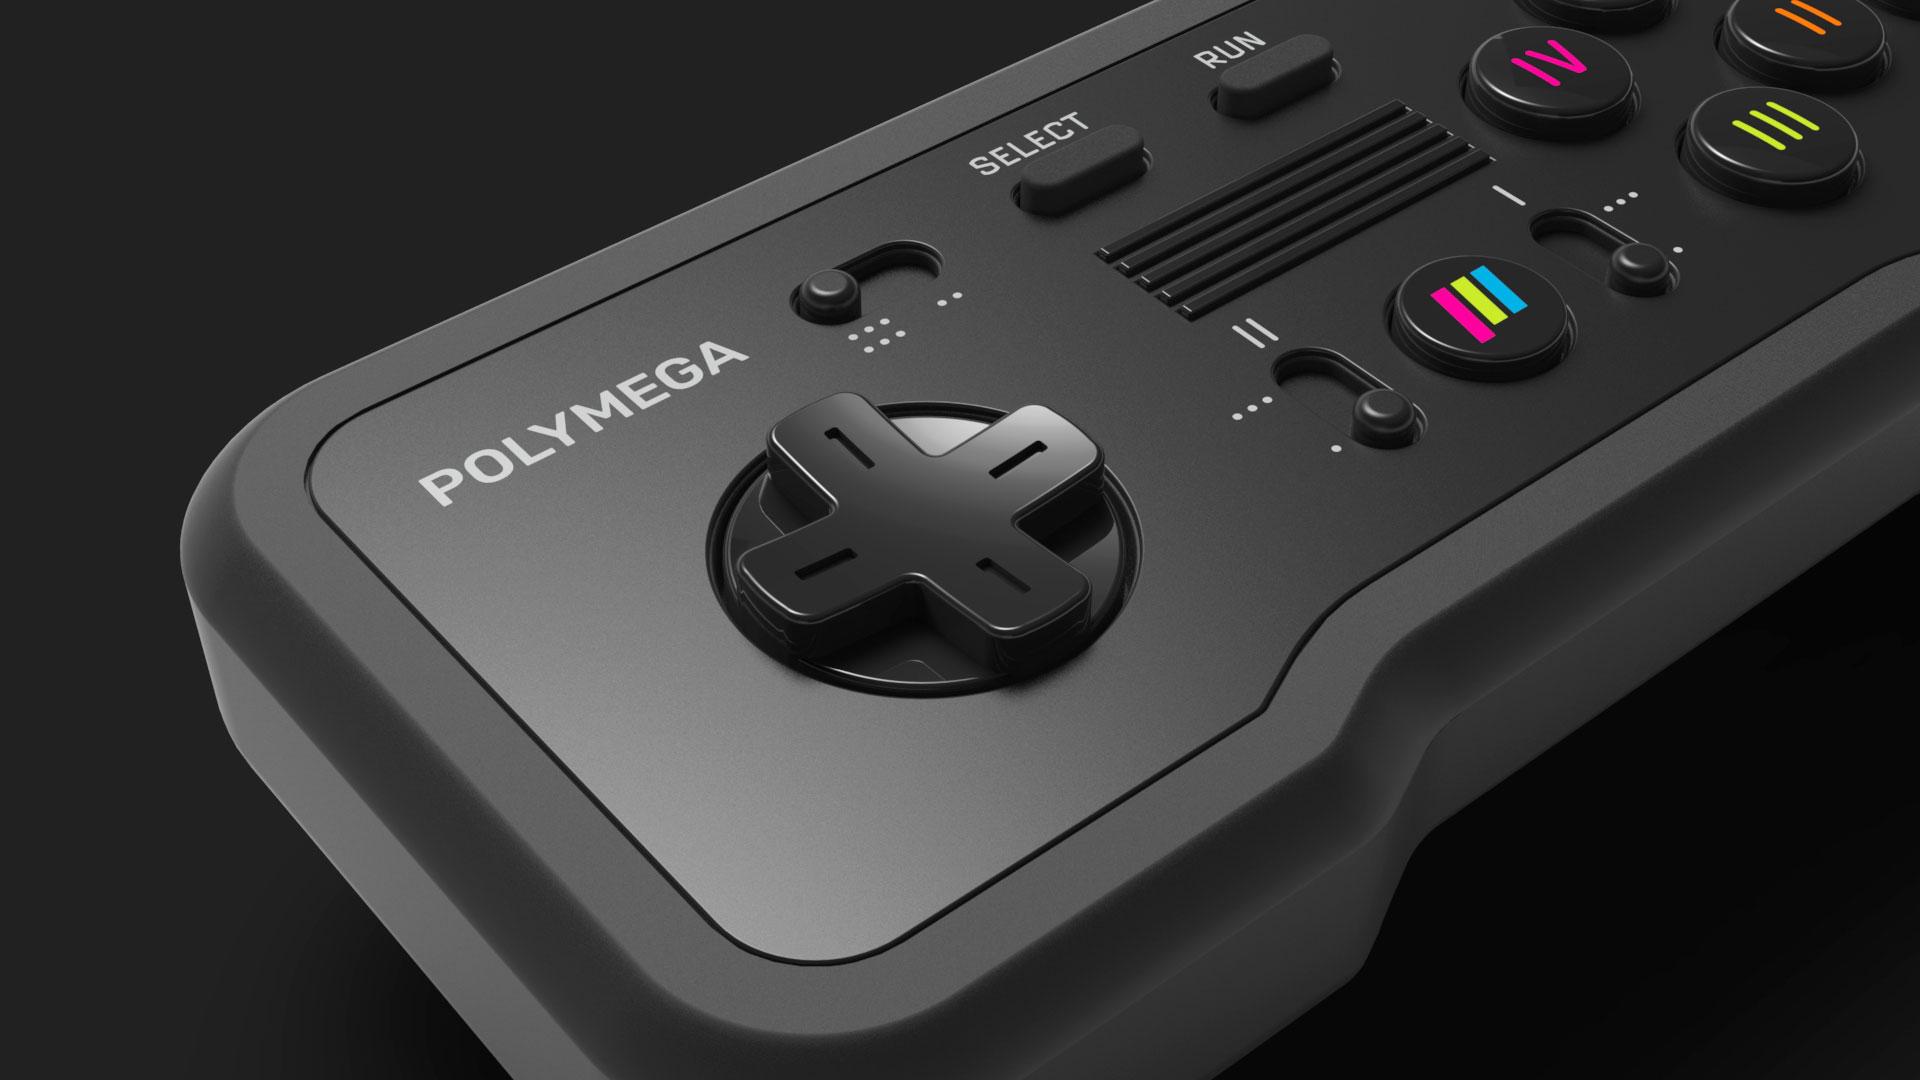 polymega turbo 3 - Nowa konsola Polymega ze wsparciem m.in. dla PlayStation oraz Sega Saturn